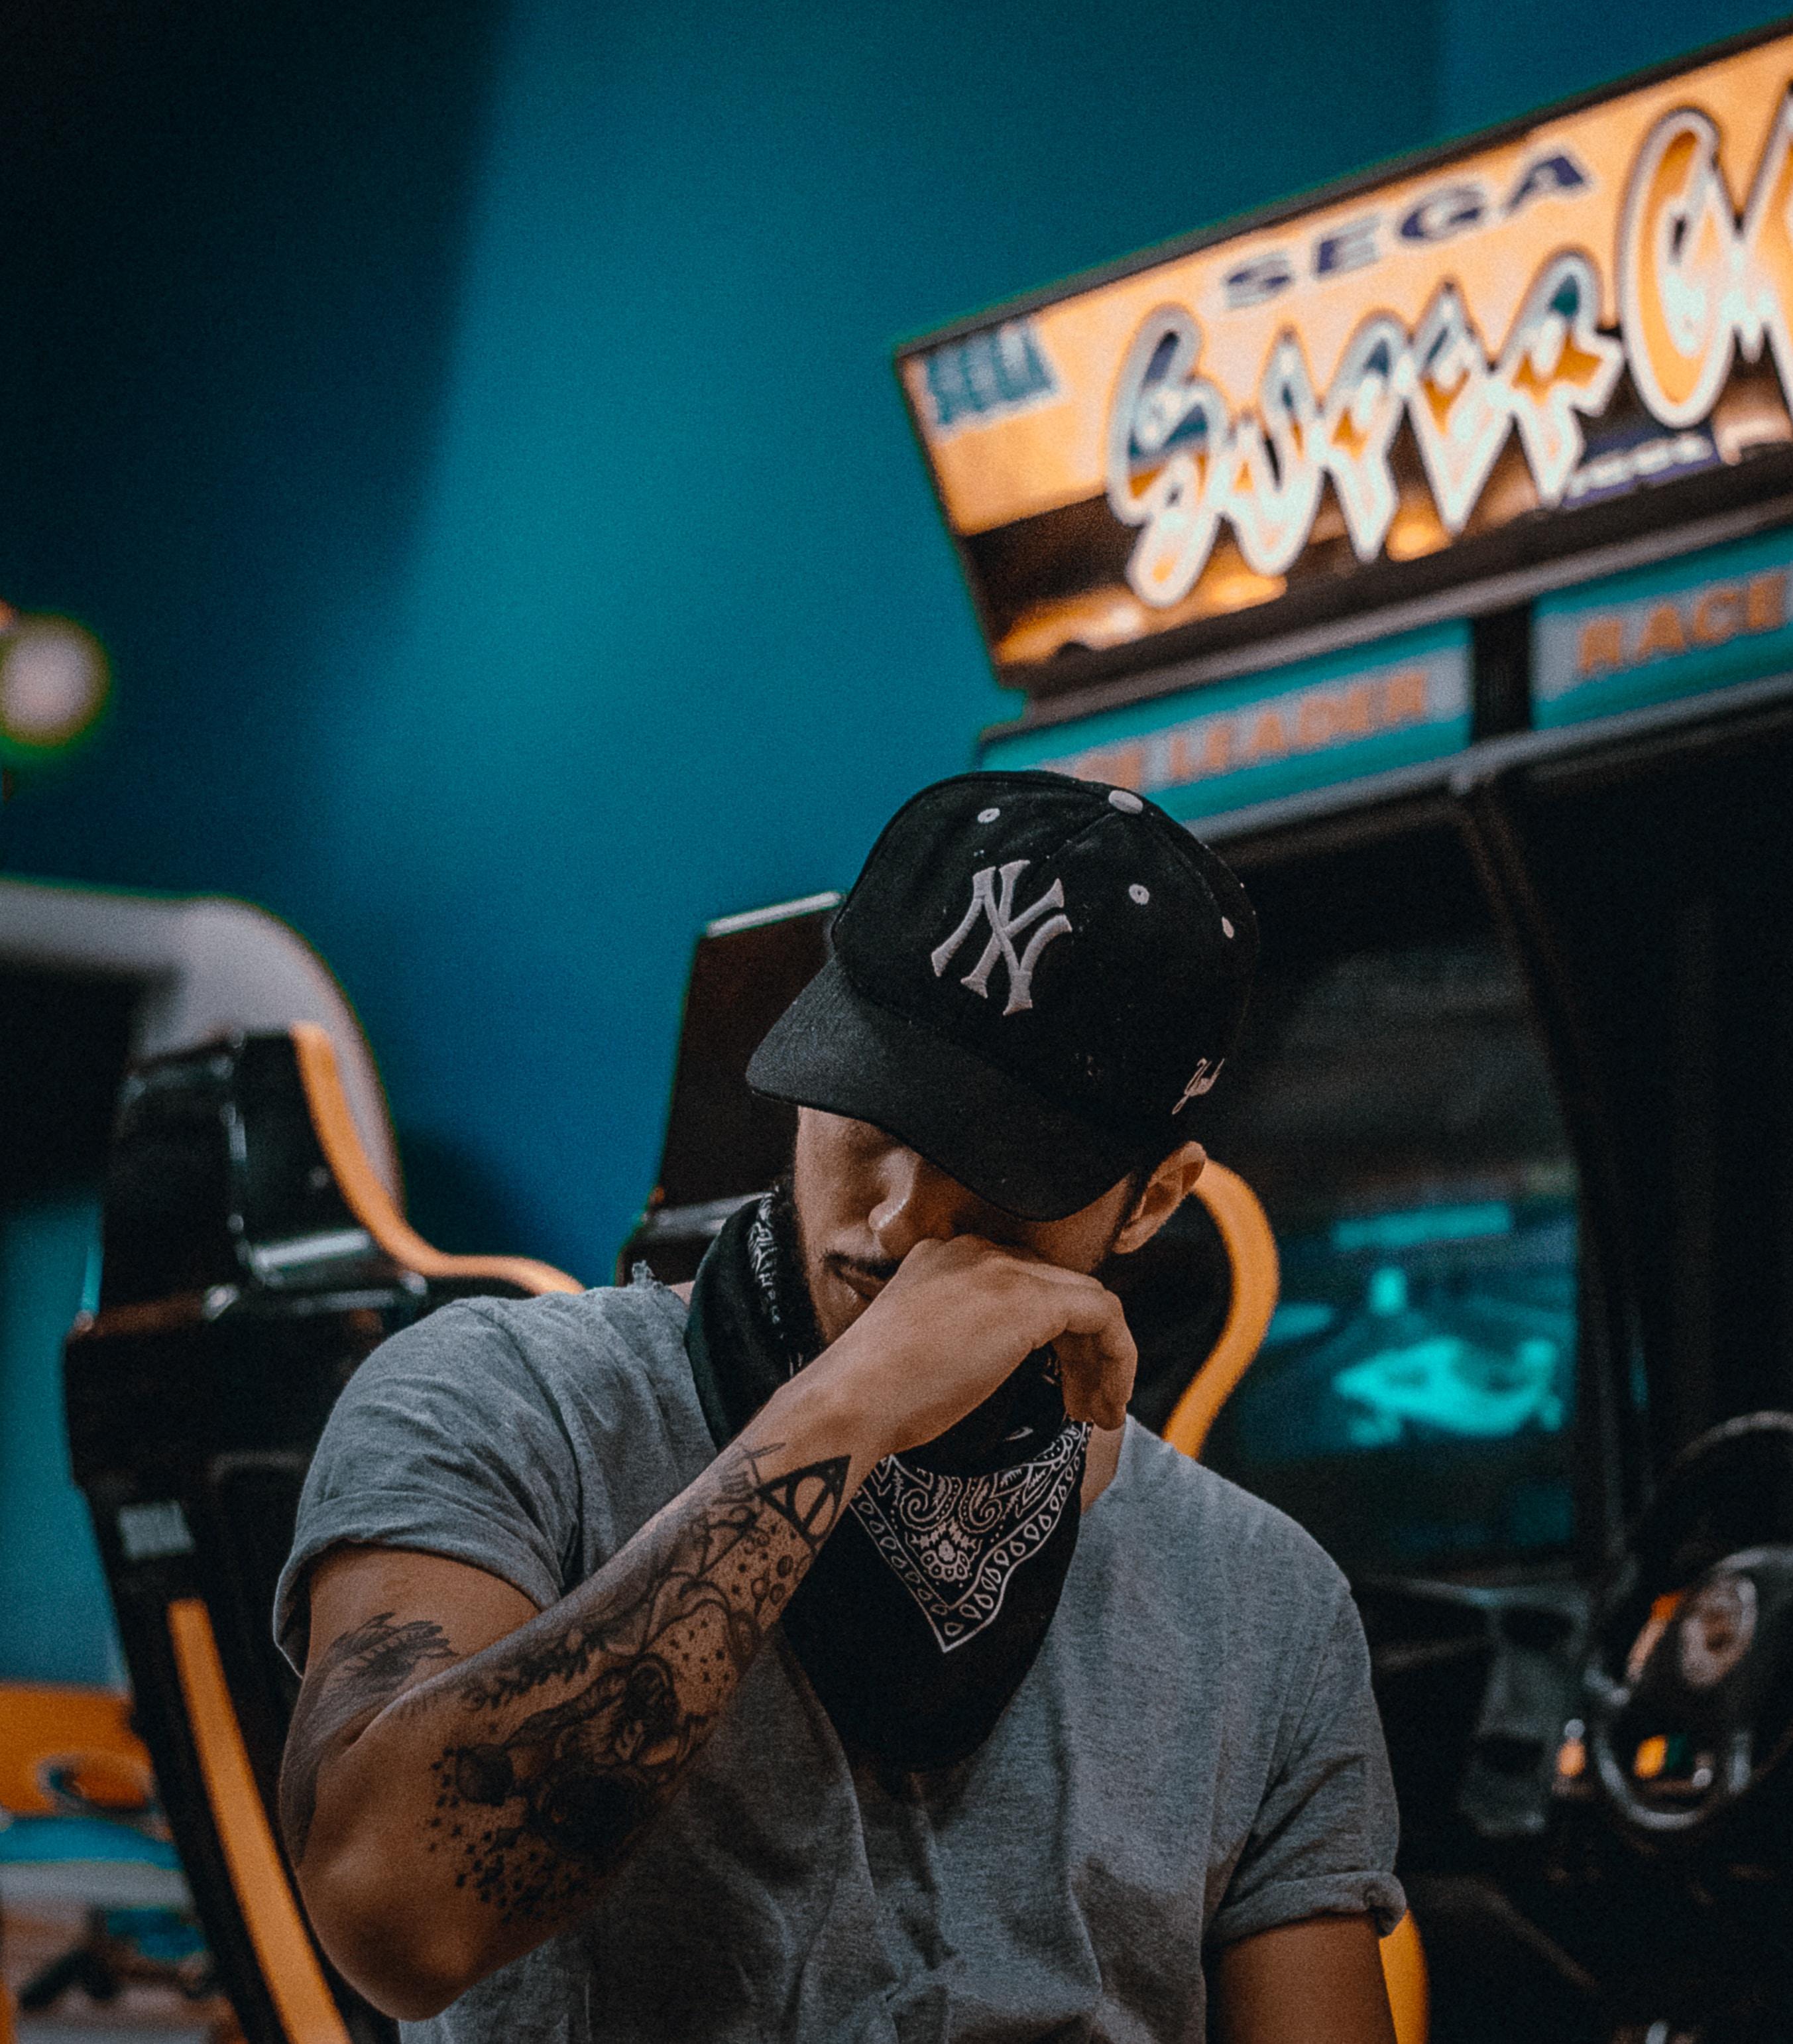 man sits near racing arcade machine